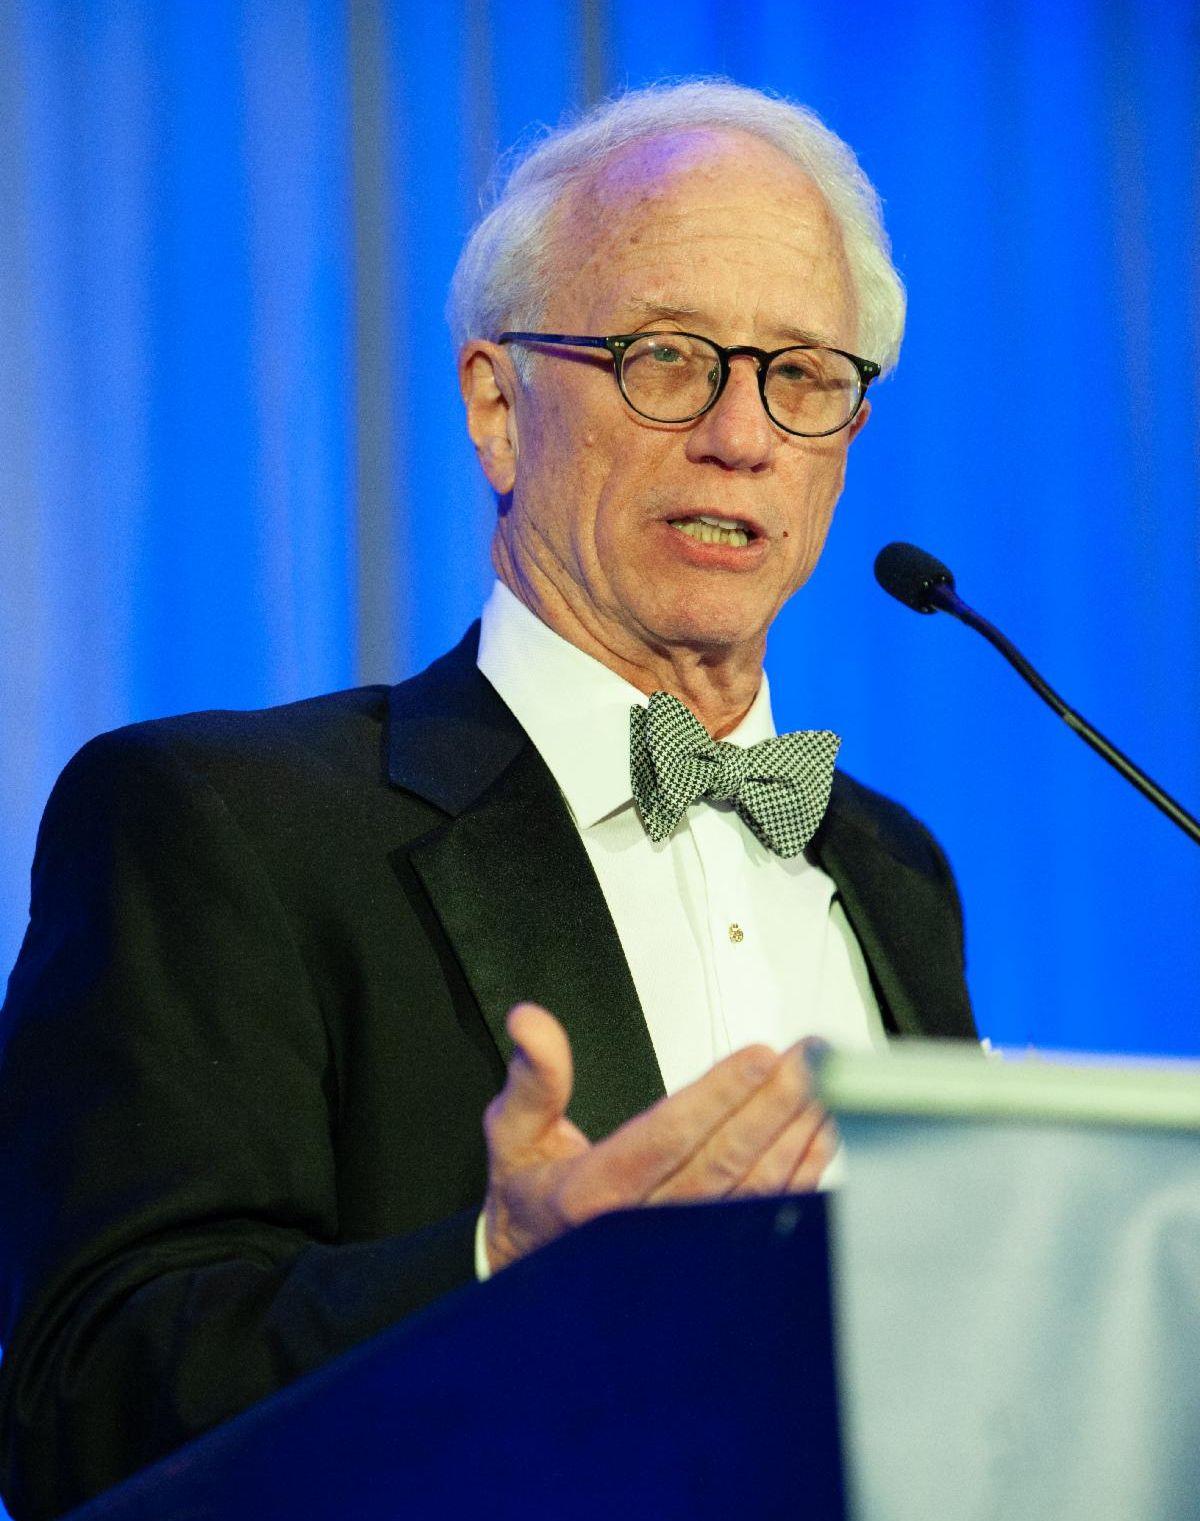 Charles Menges makes remarks upon receiving 2020 Legislative Advocacy Award